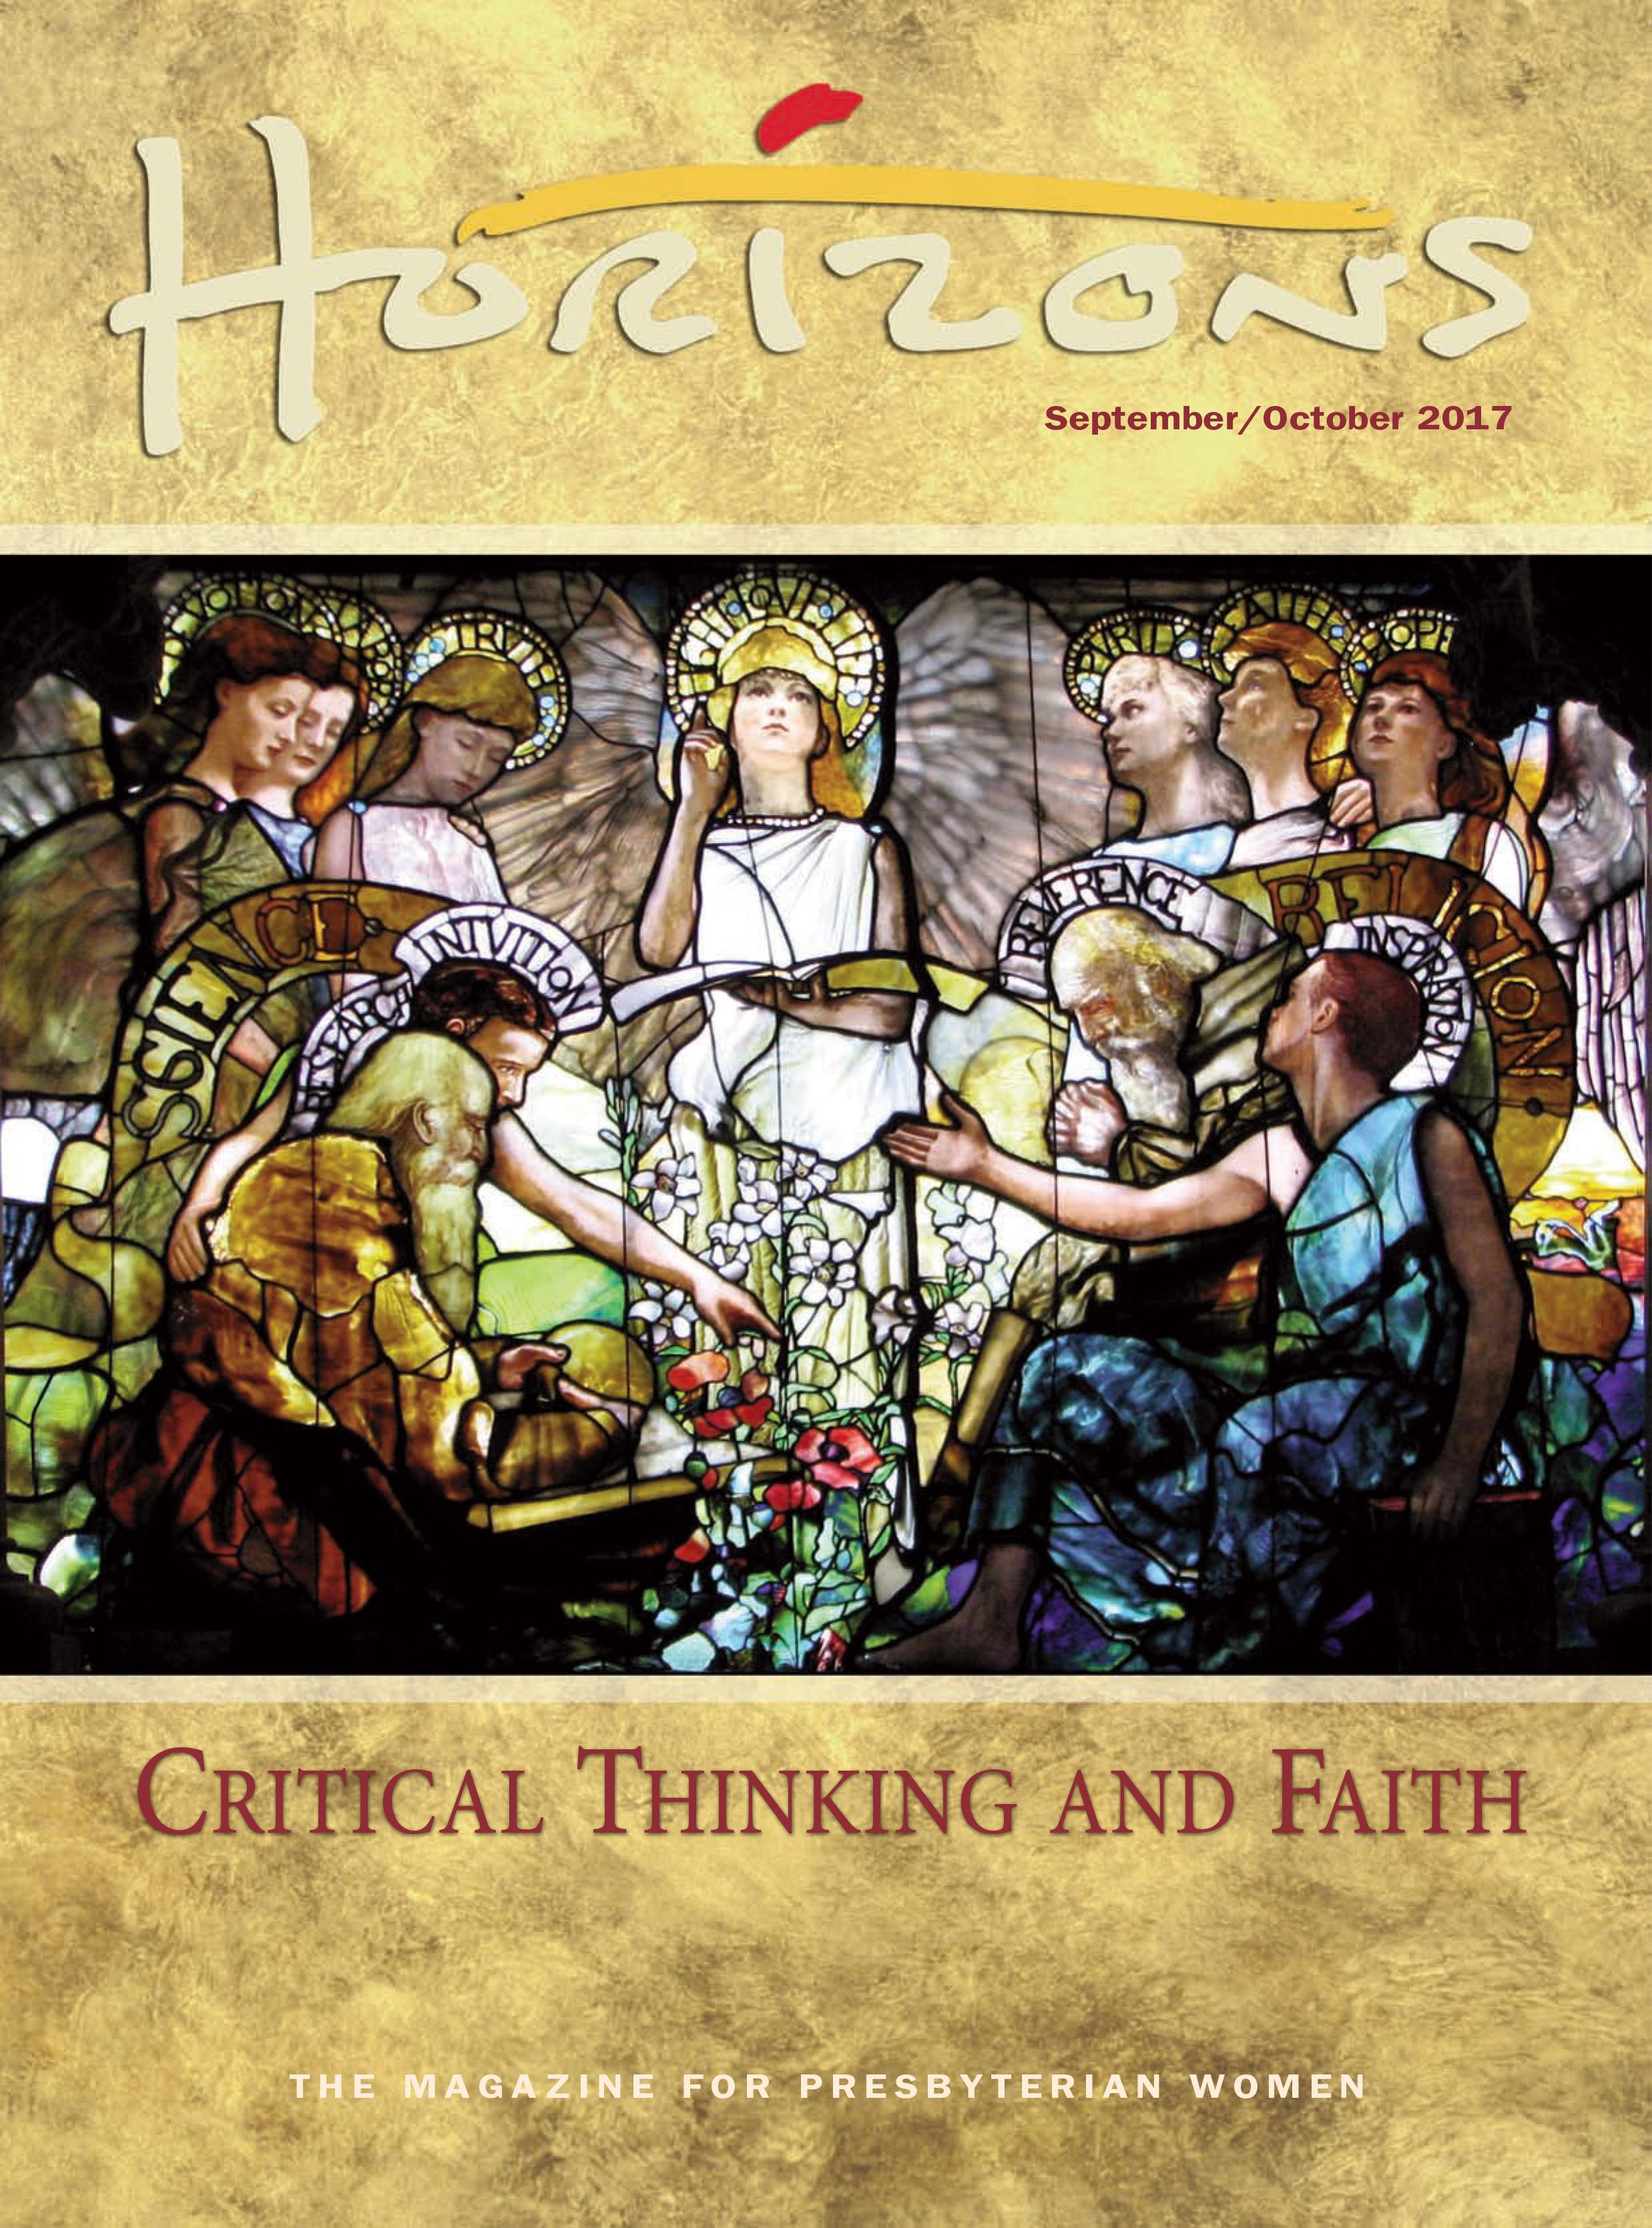 Critical Thinking and Faith